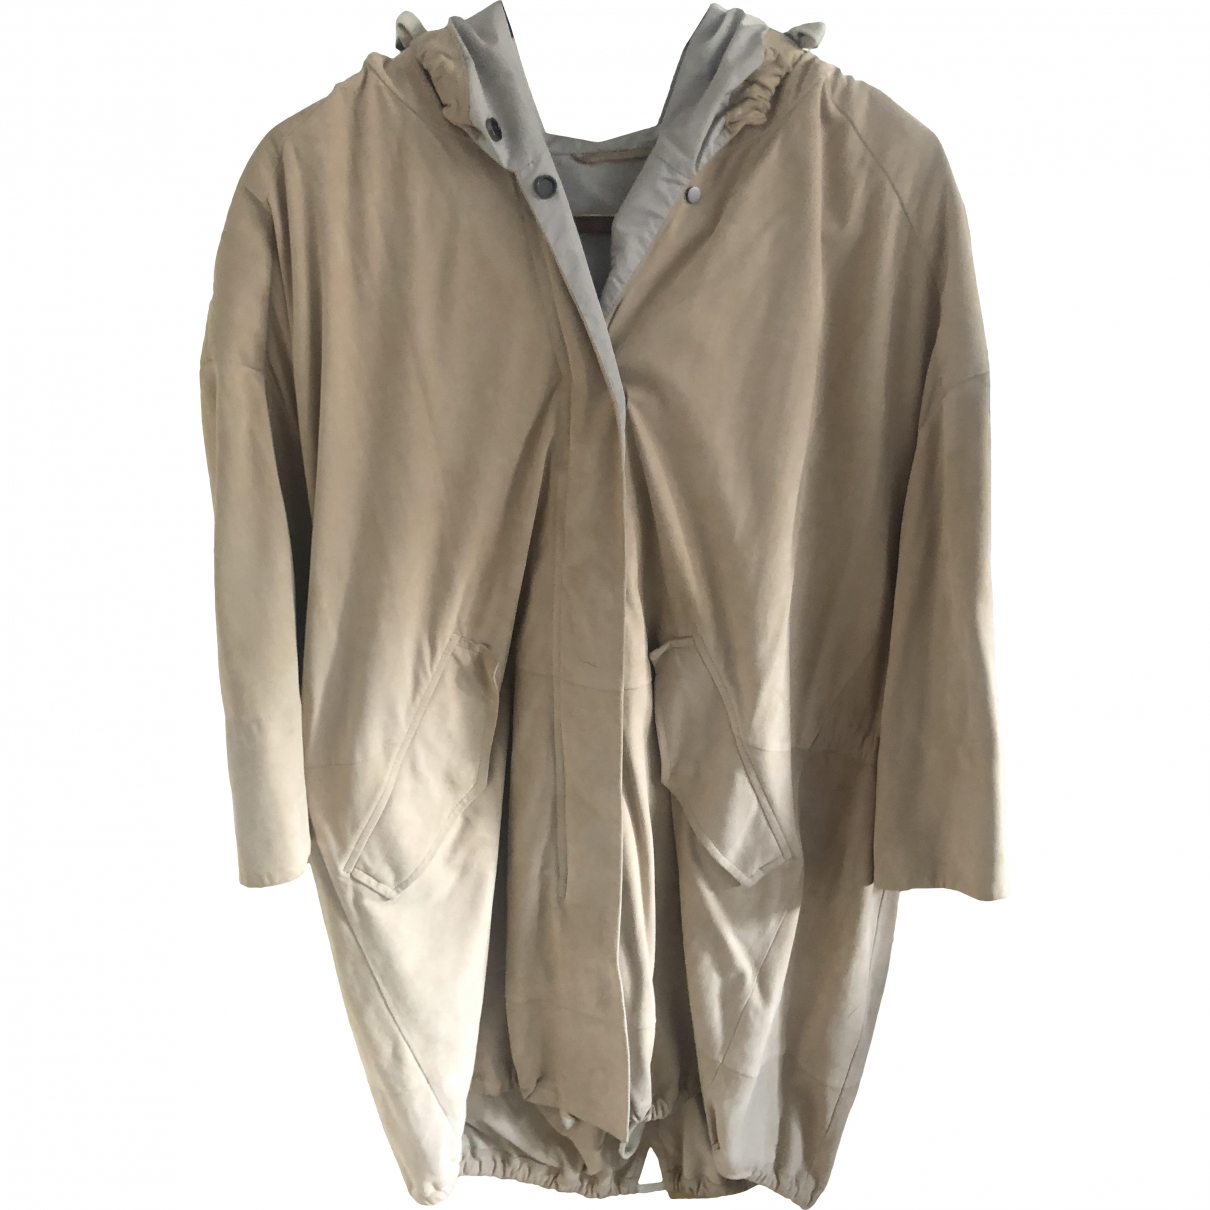 Brunello Cucinelli \N Beige Suede coat for Women 44 IT